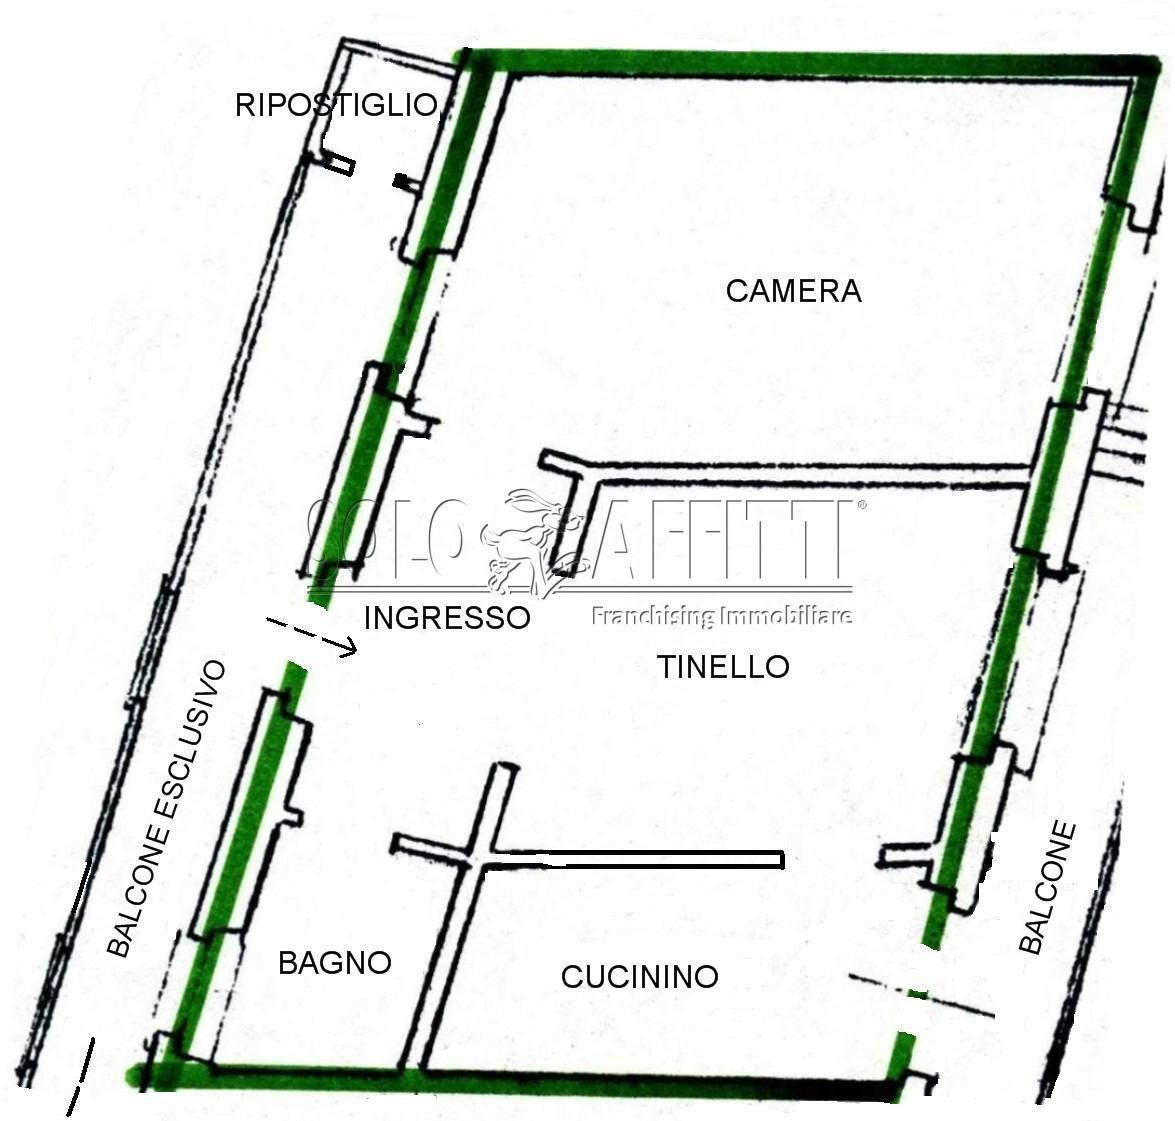 Bilocale Settimo Torinese Via Italia 62 12